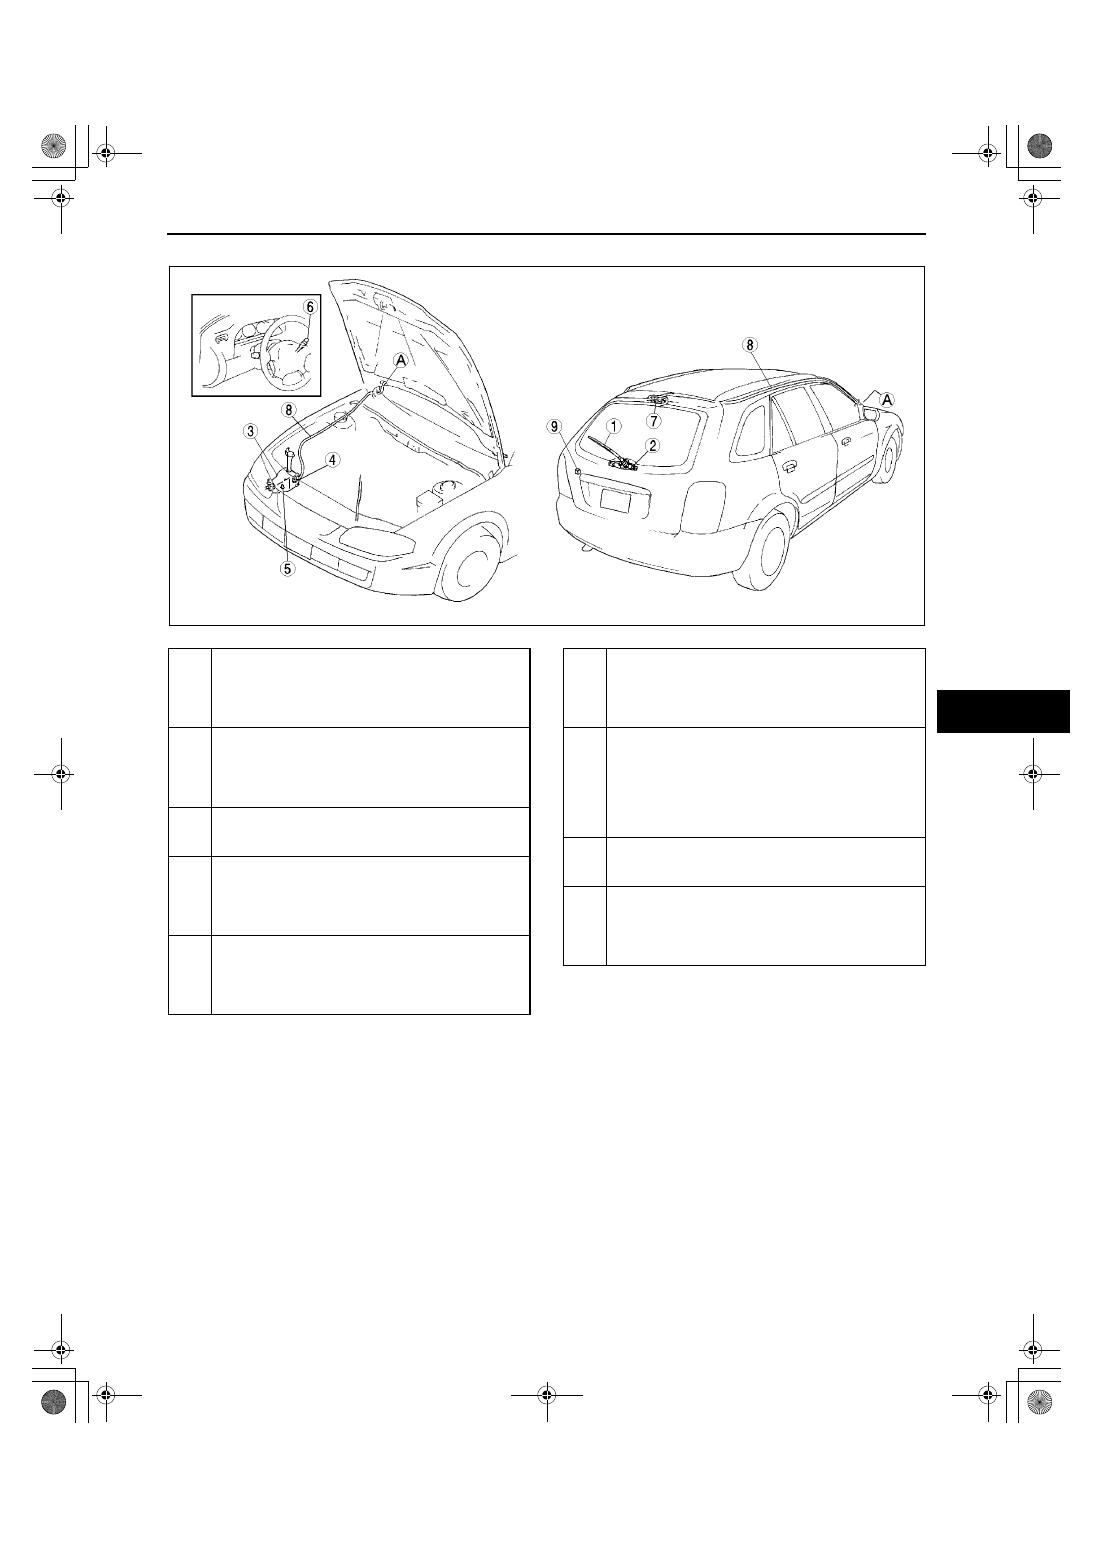 Mazda Protege 5 Manual Part 344 02 1 8l Engine Diagram Wiper Washer System